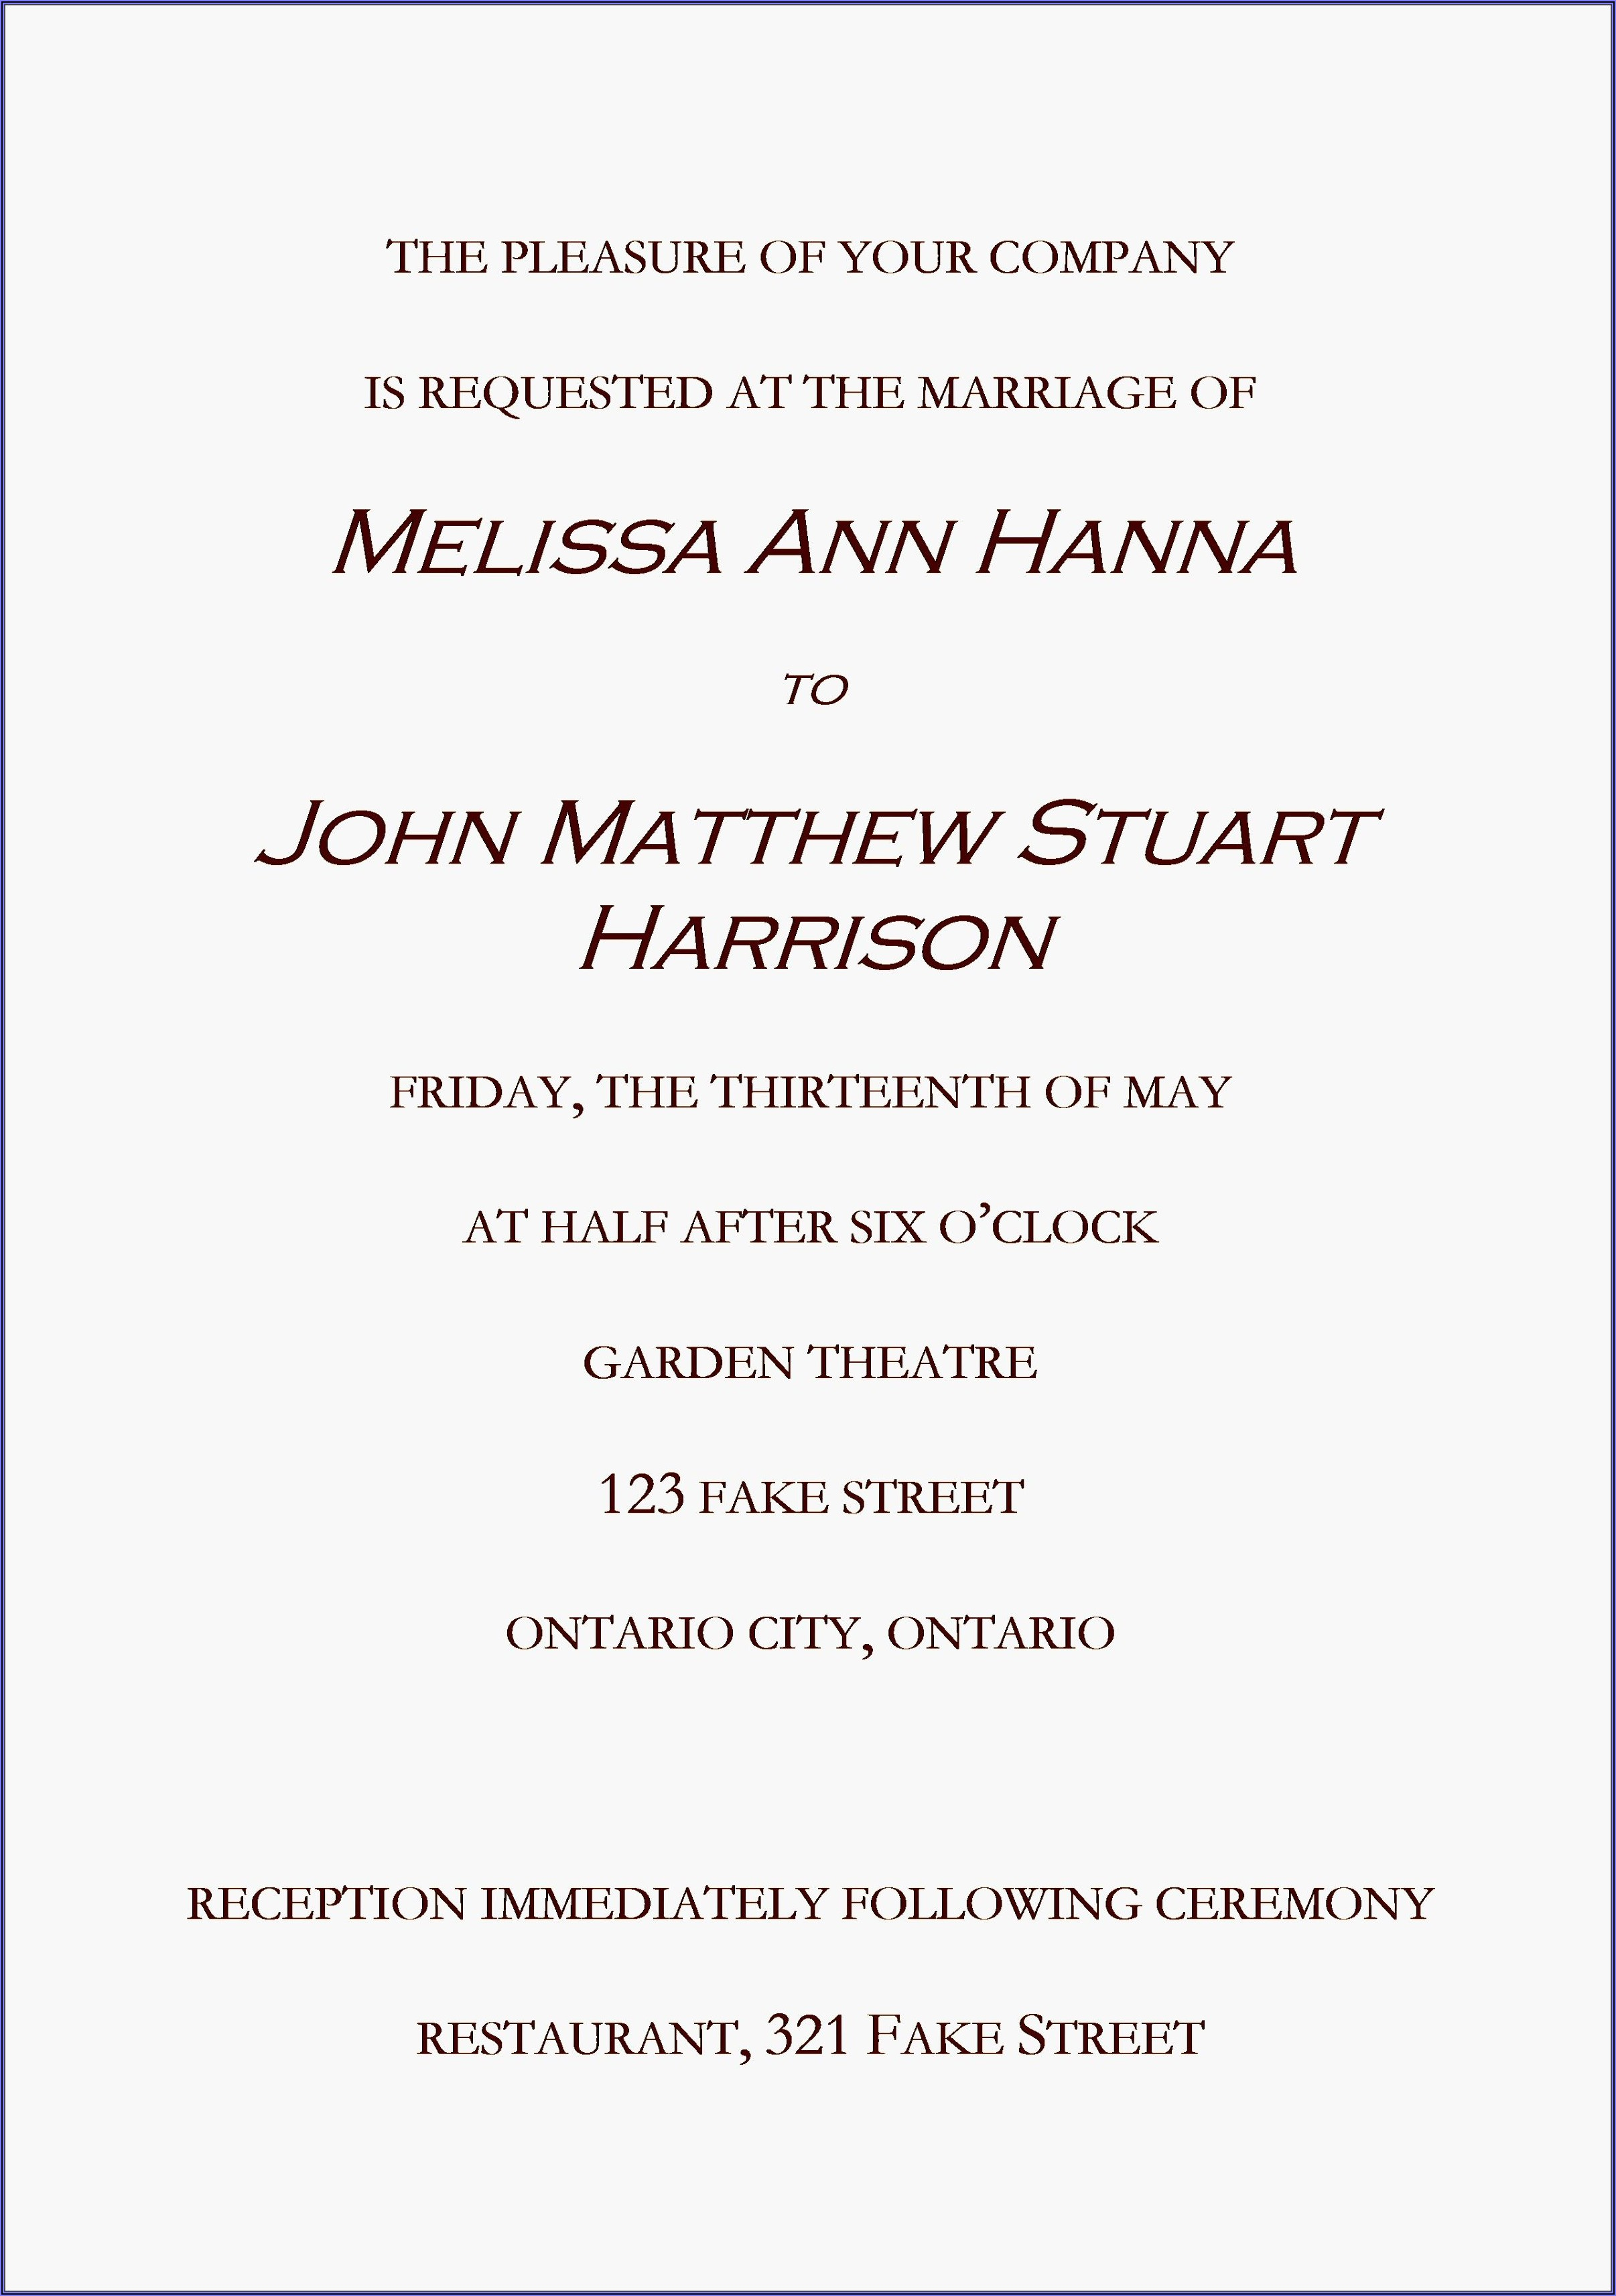 Wedding Invitation Mail Content